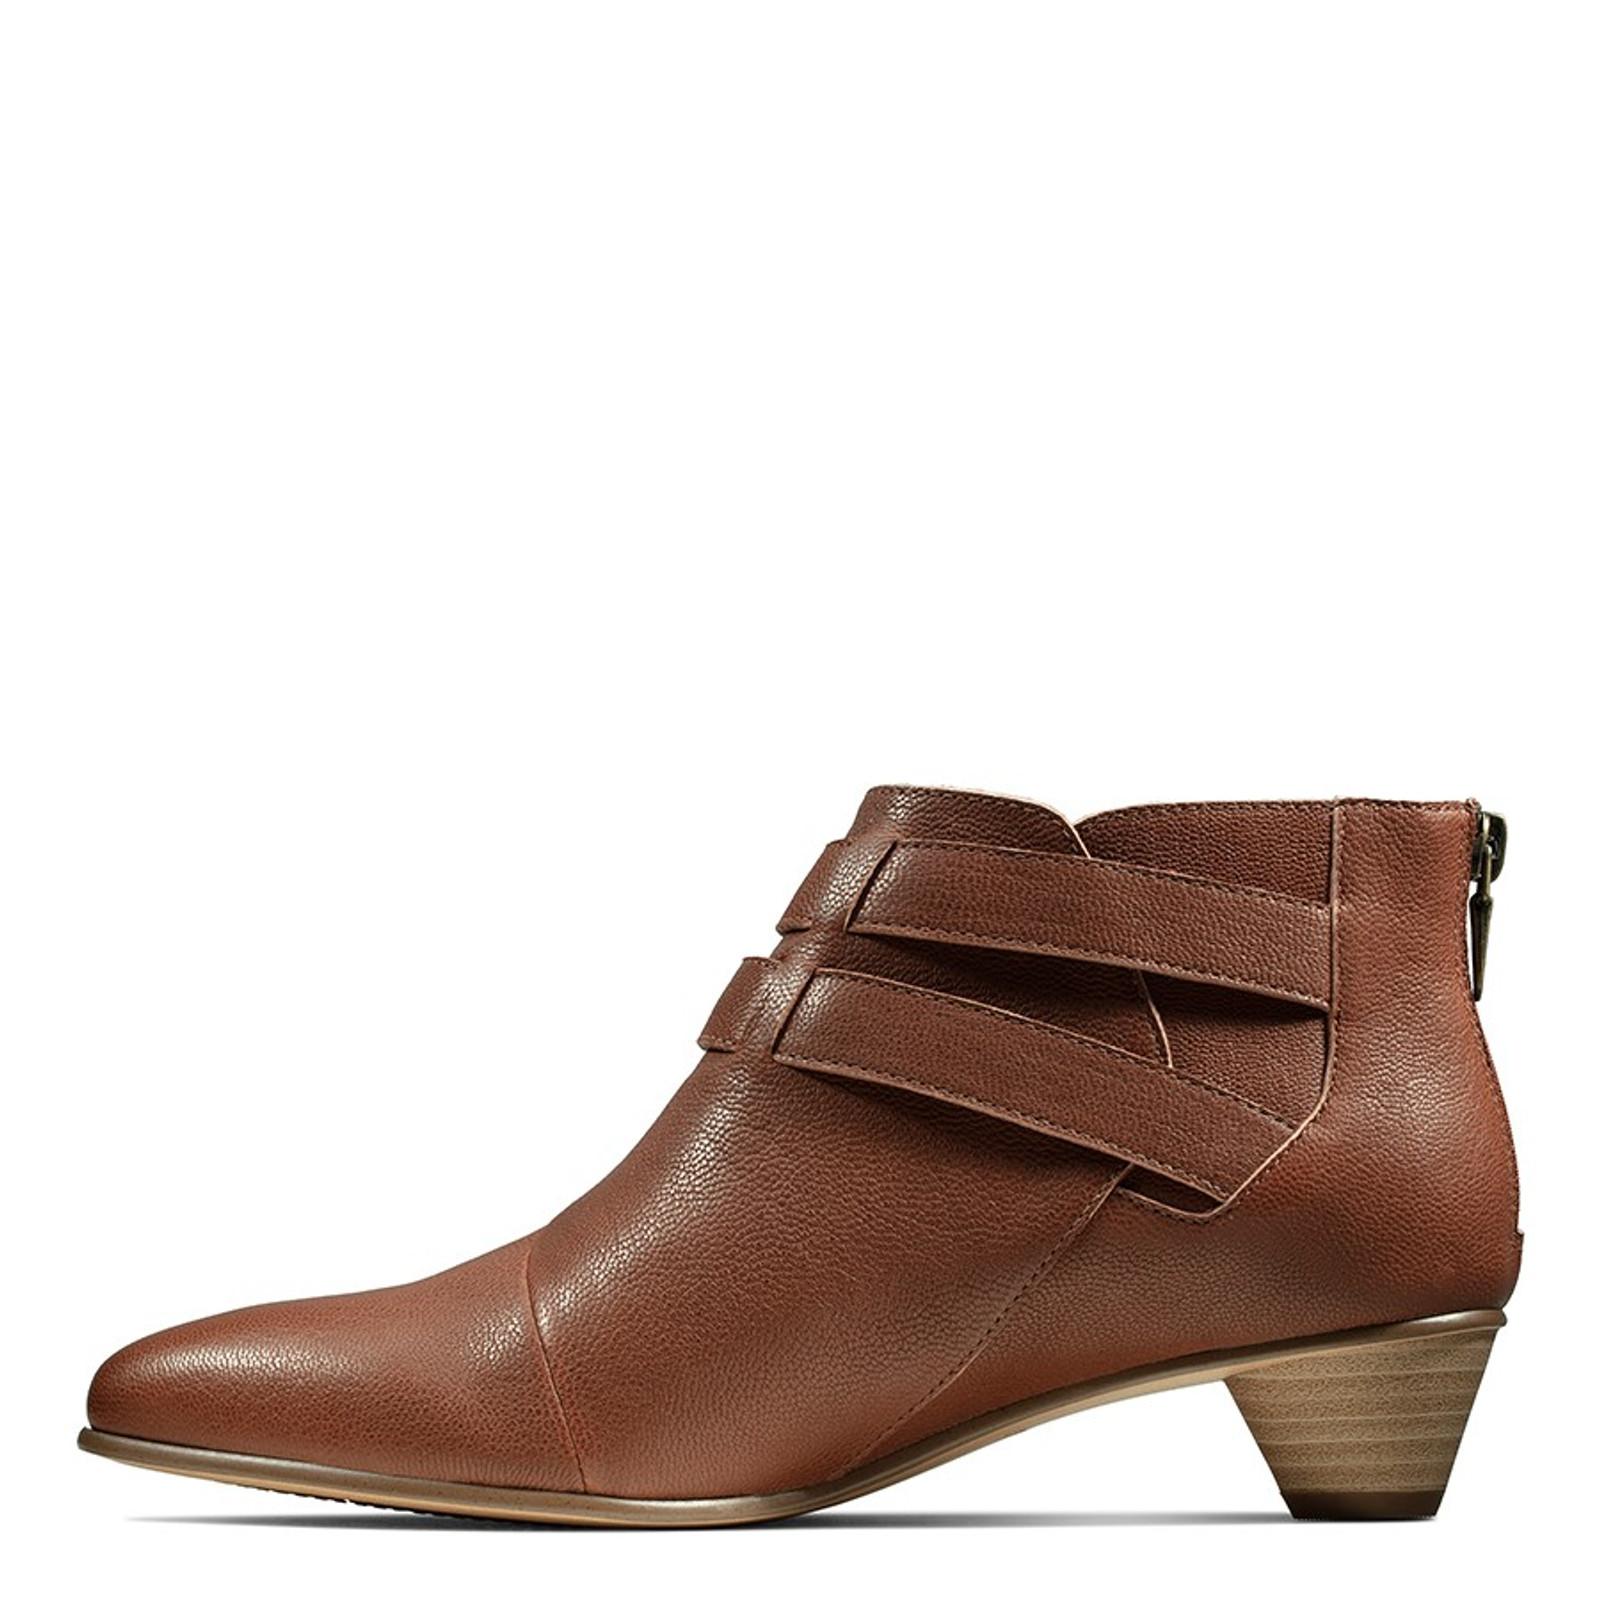 Clarks Womens MENA SAGE Tan Leather